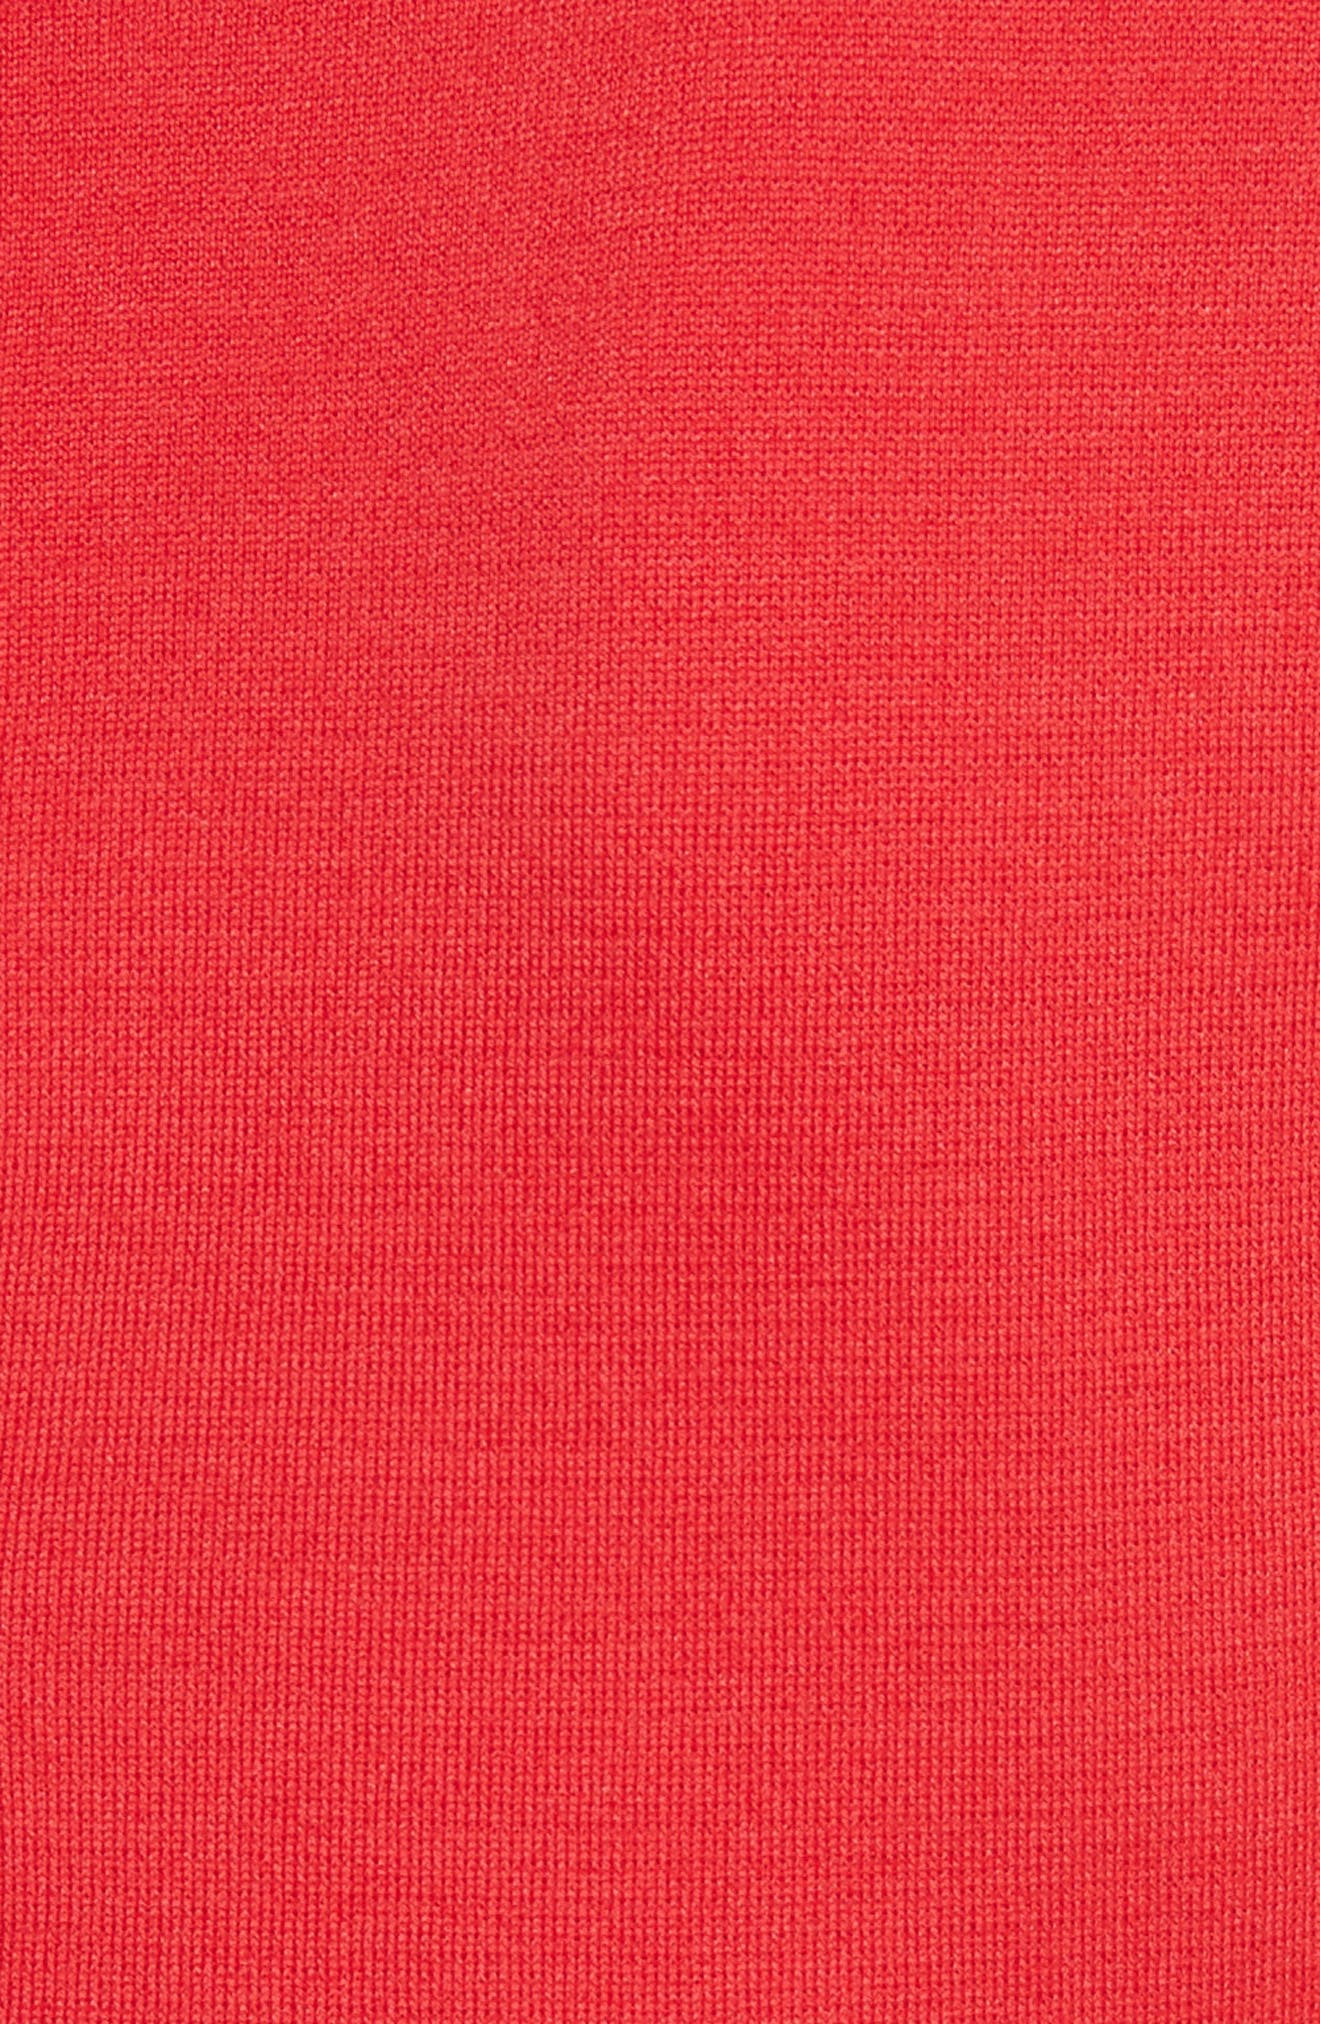 Flap Front Milano Knit Dress,                             Alternate thumbnail 5, color,                             610